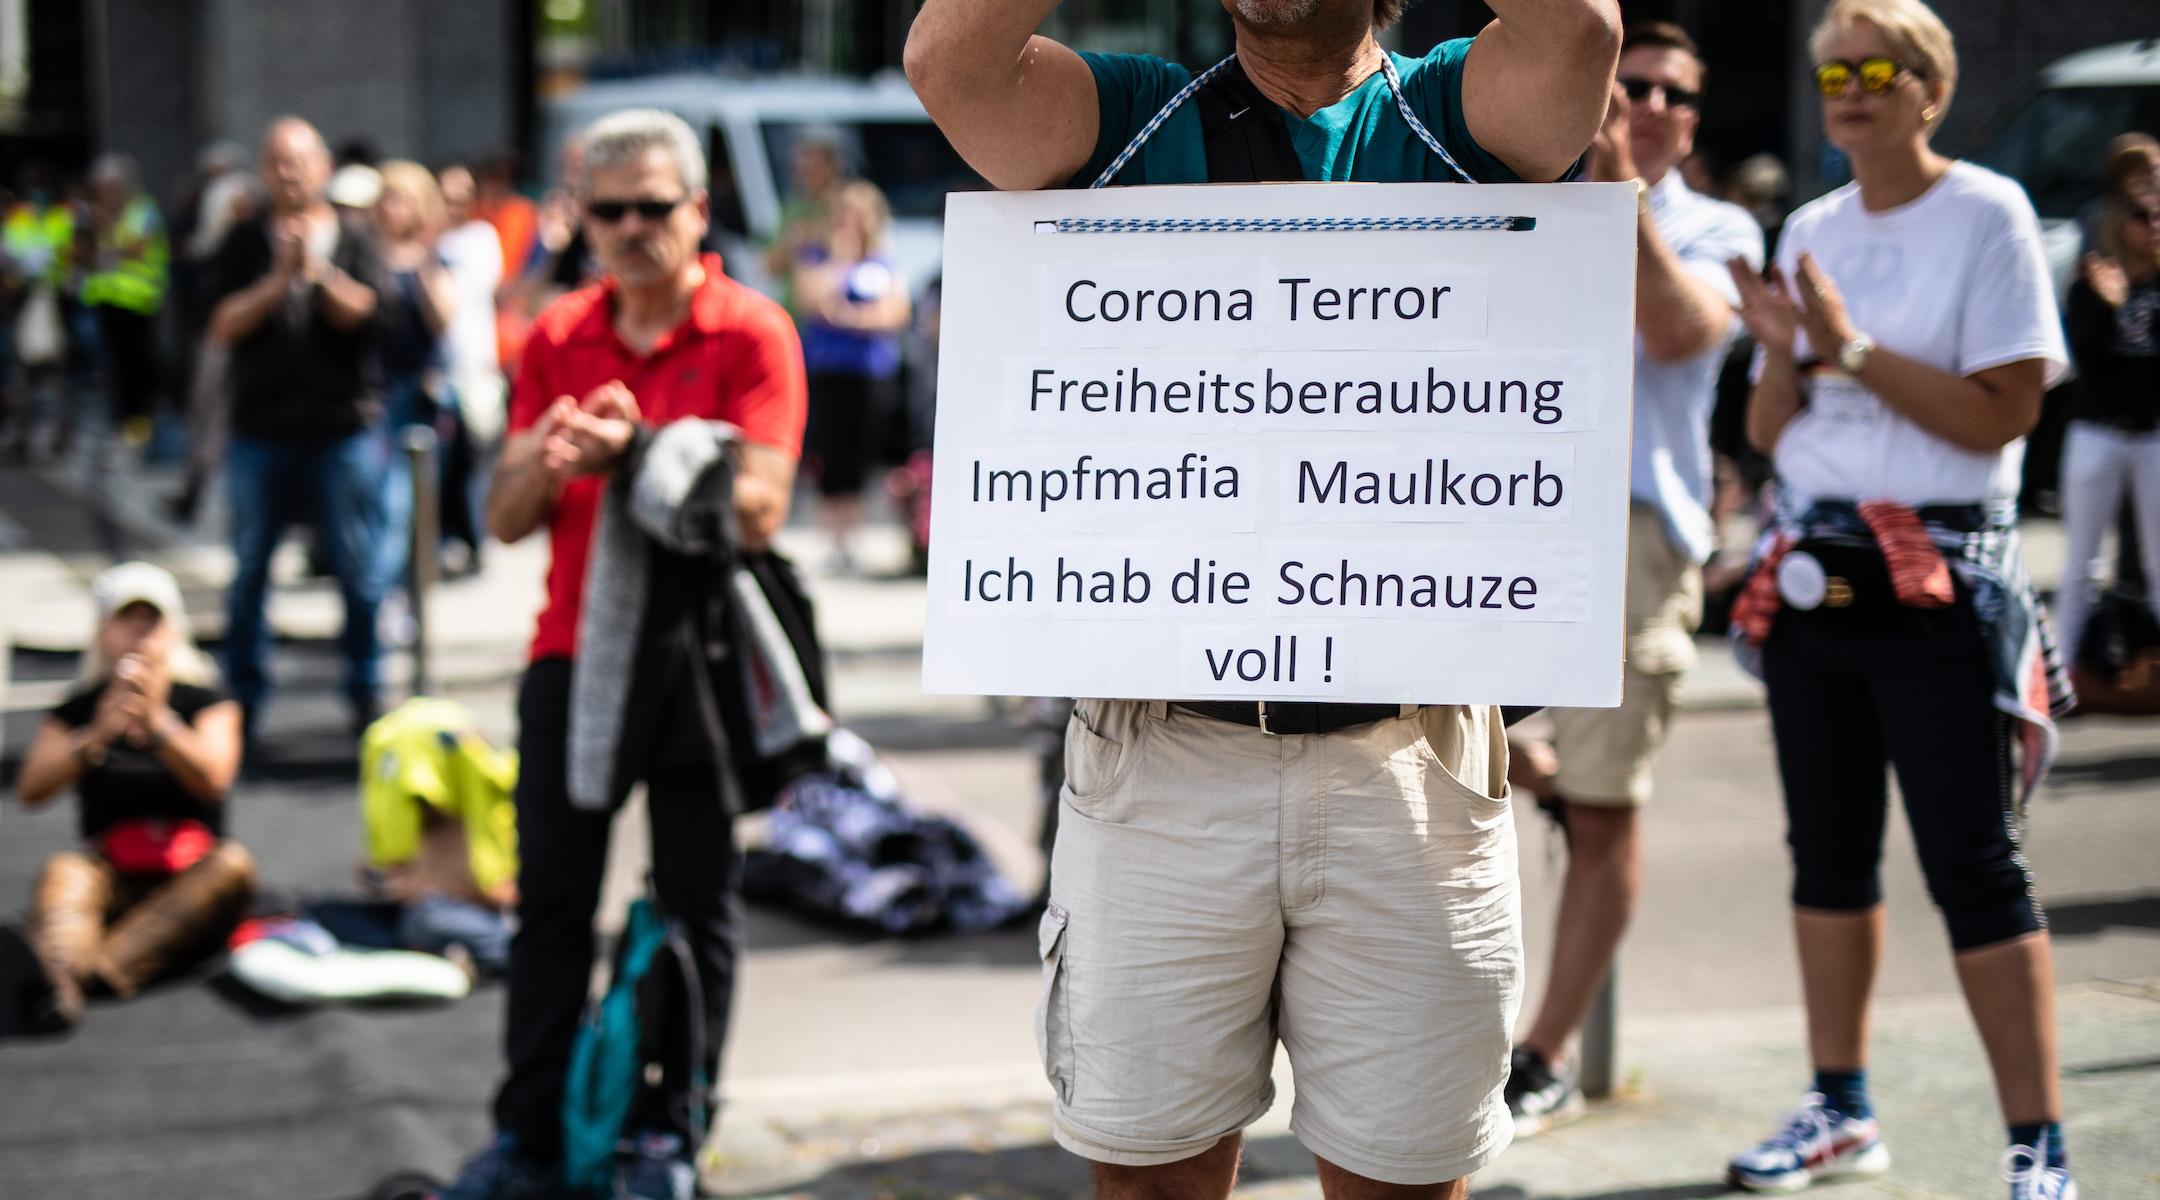 After German Jewish groups raise concerns, Munich bans display of yellow stars at coronavirus protests